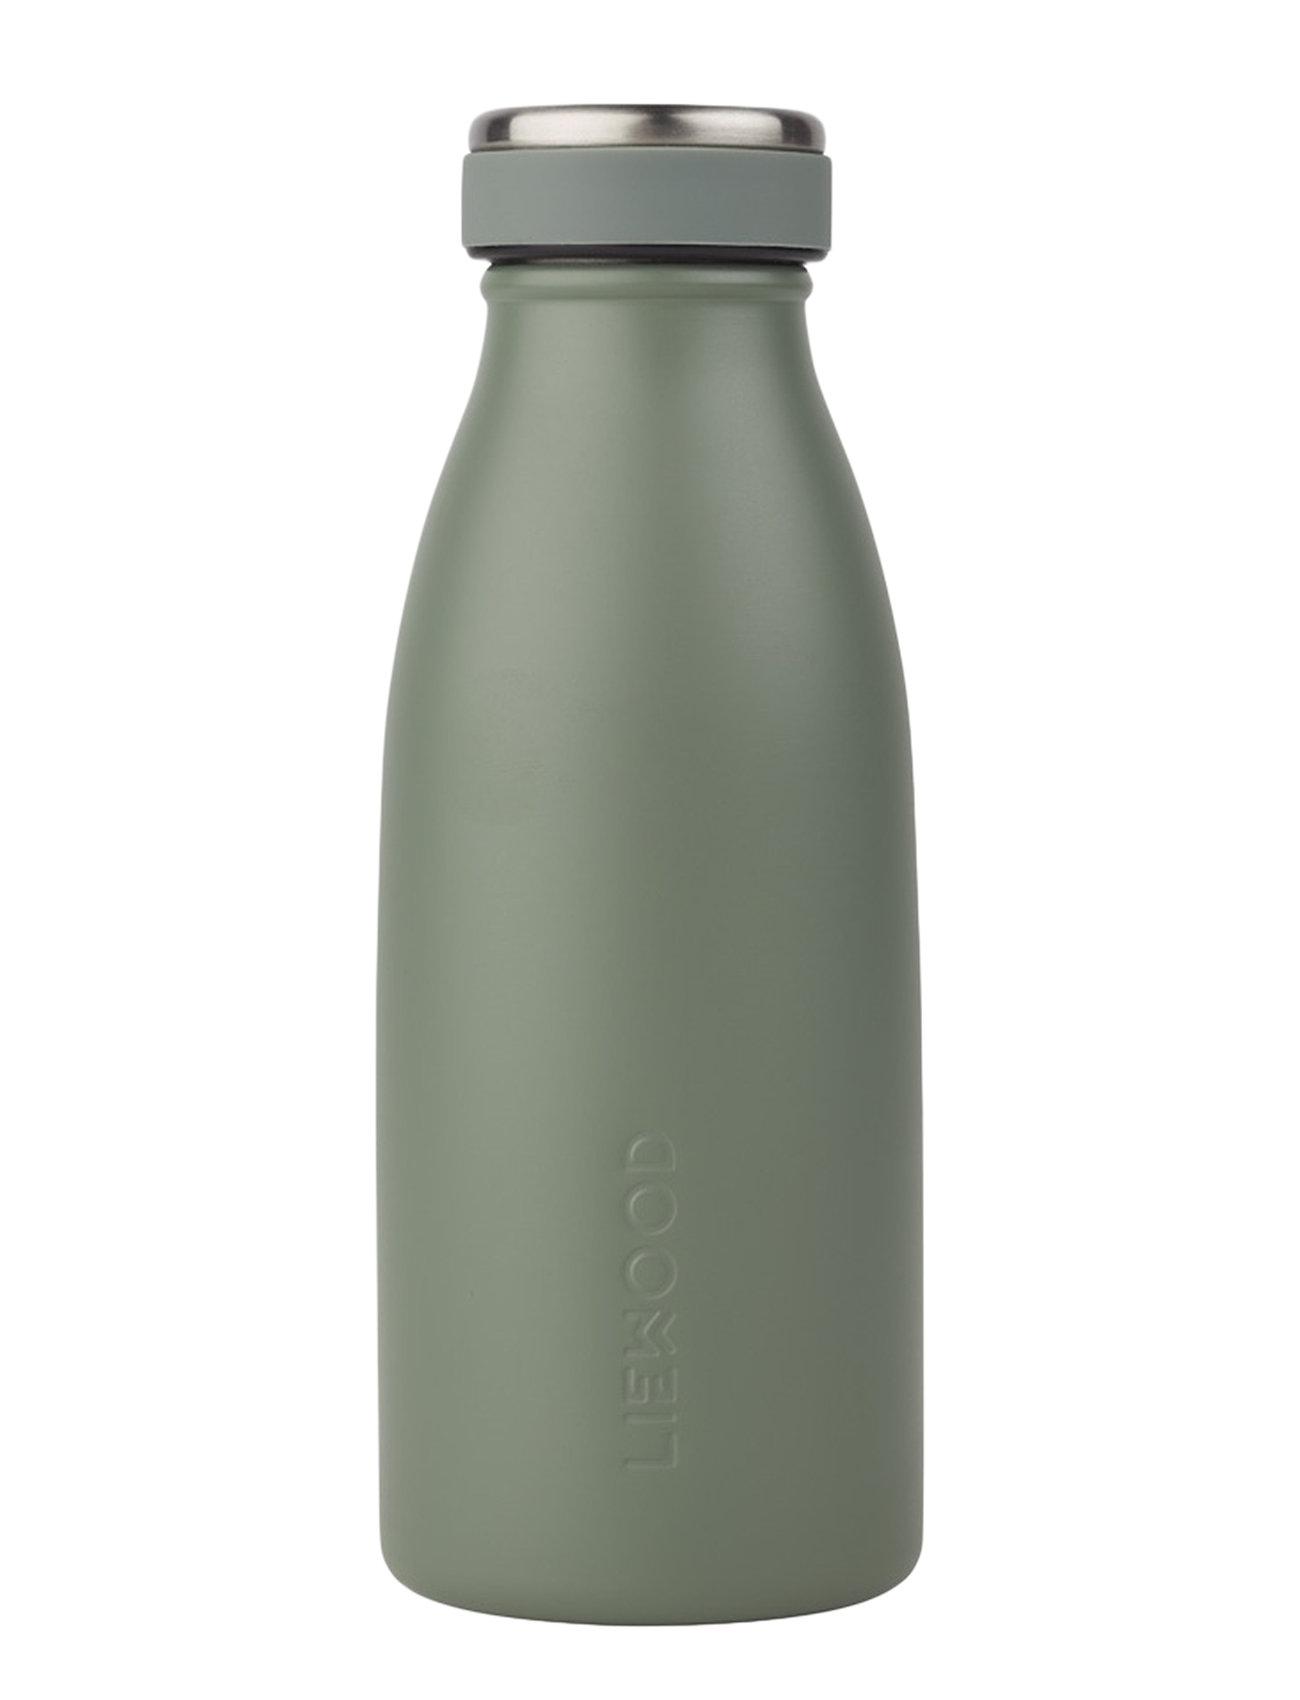 Liewood Estella water bottle - FAUNE GREEN